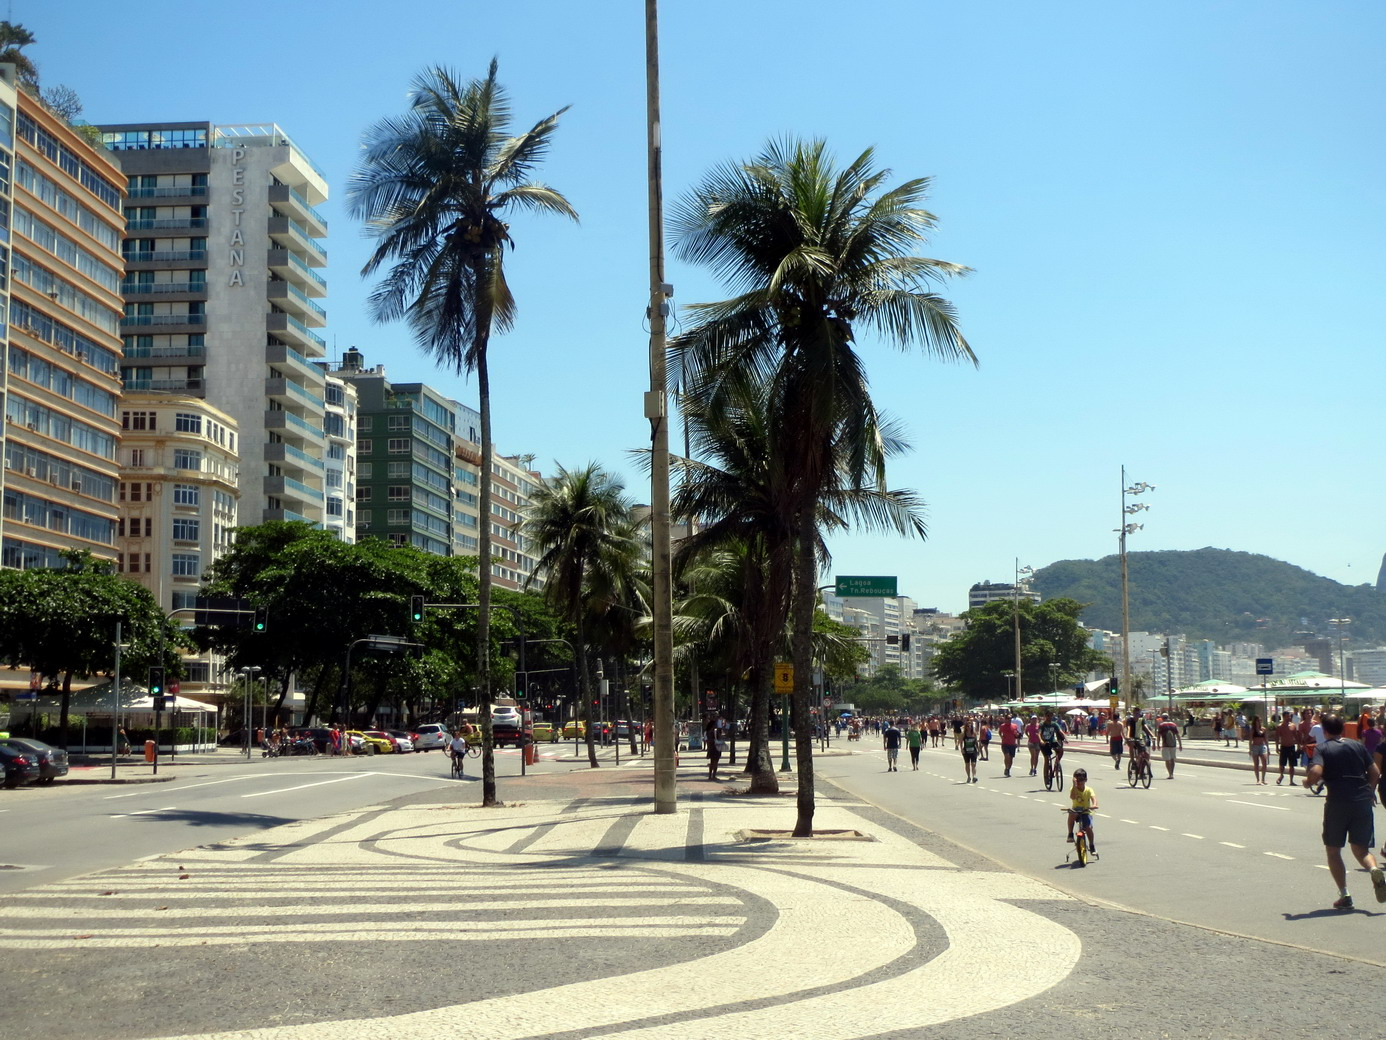 37. Plage de Copacabana